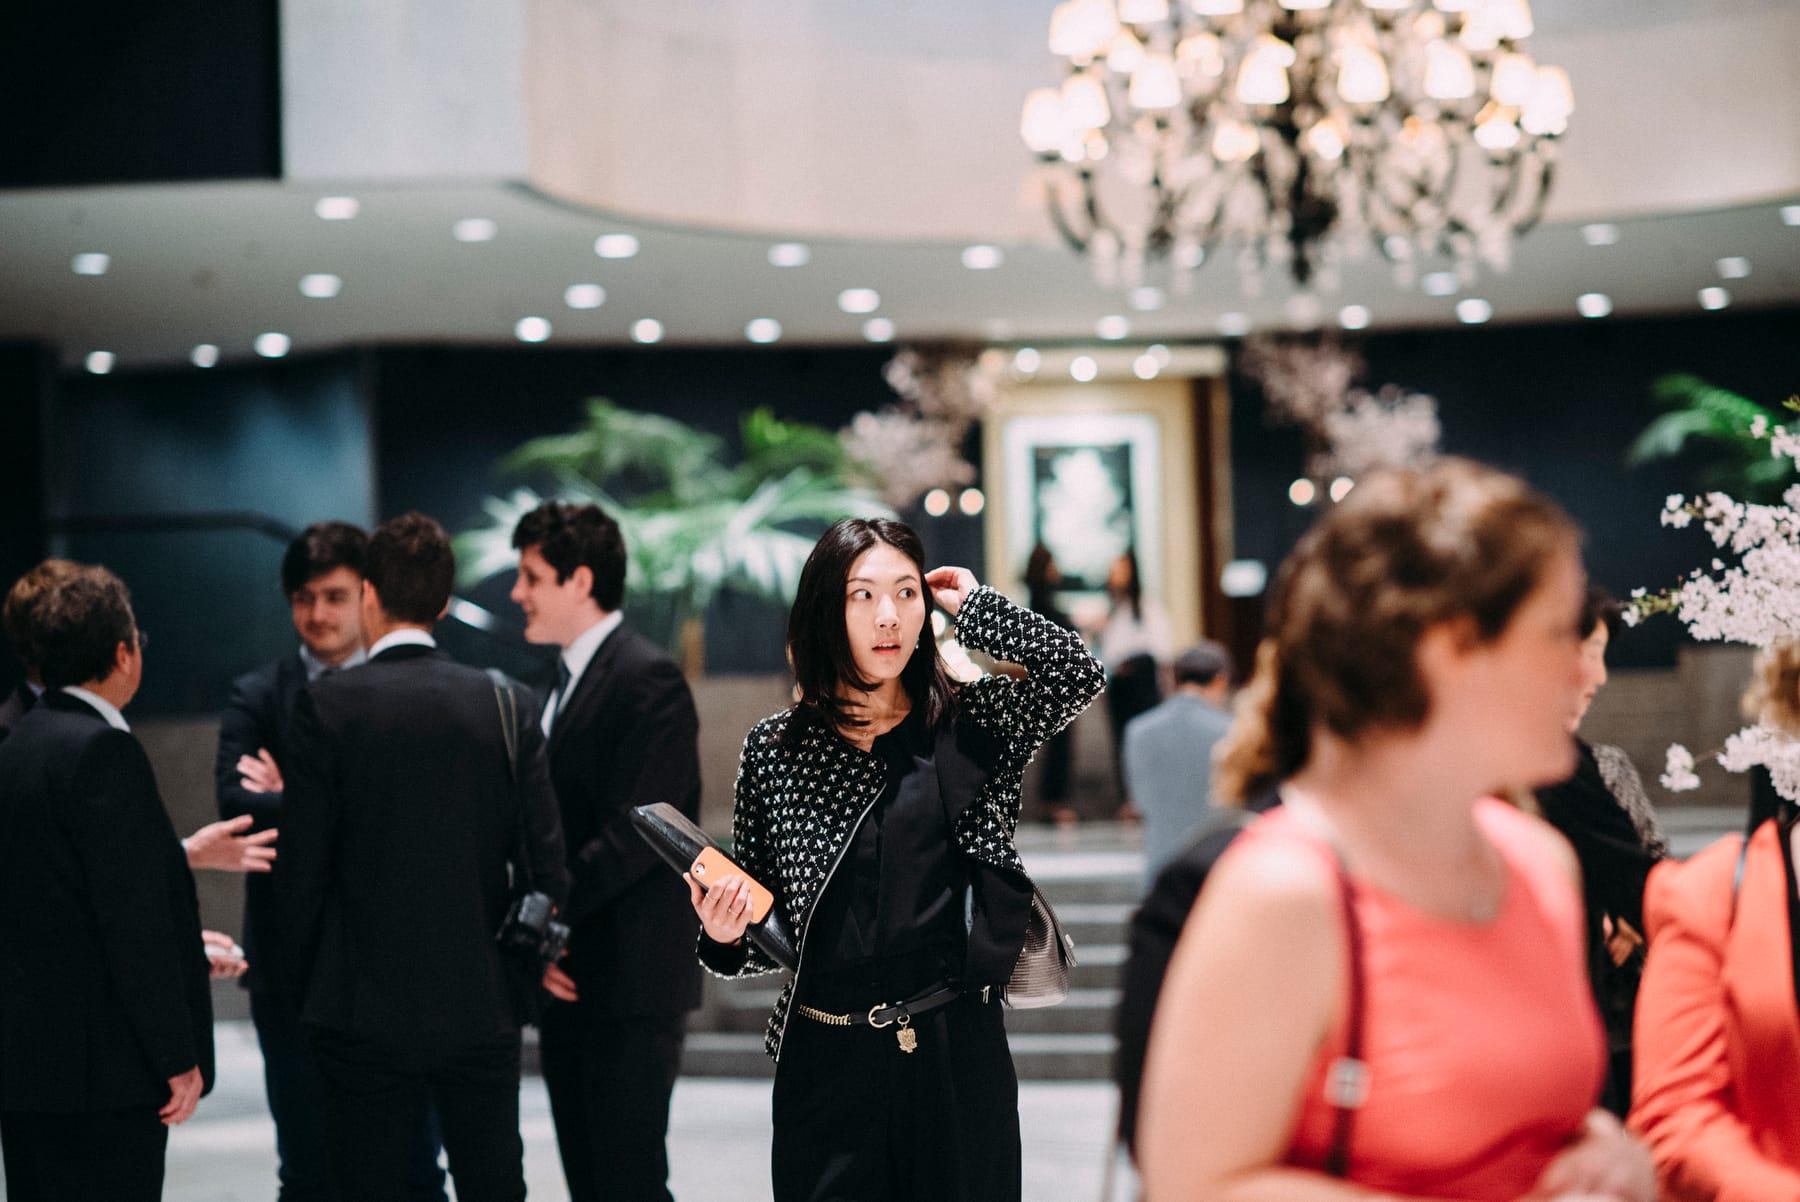 Corea fotografo para escorts